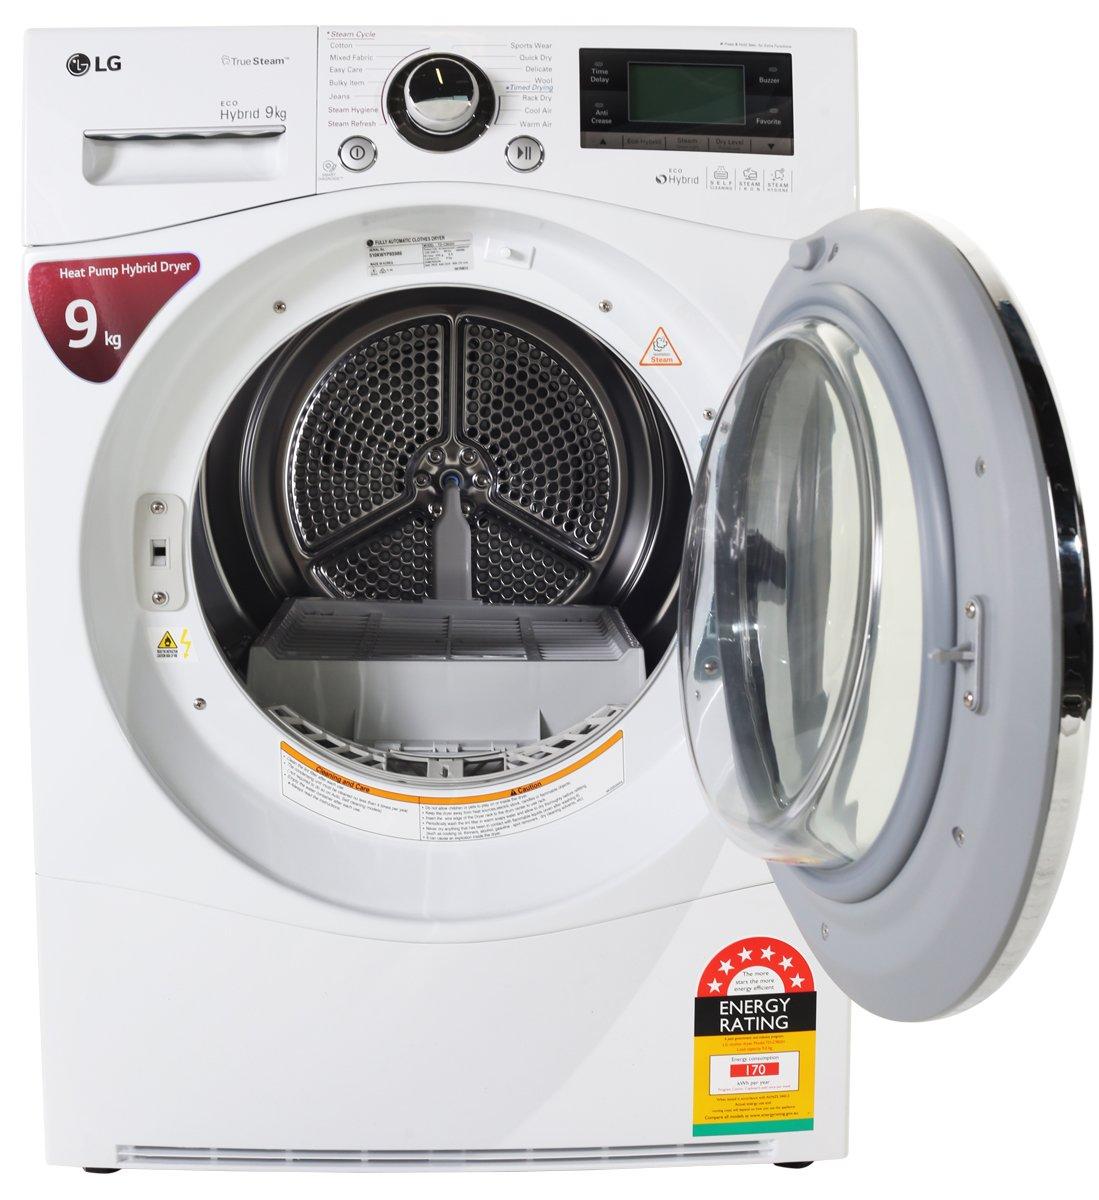 LG TD C902H 9kg Heat Pump Hybrid Dryer Open high.jpeg